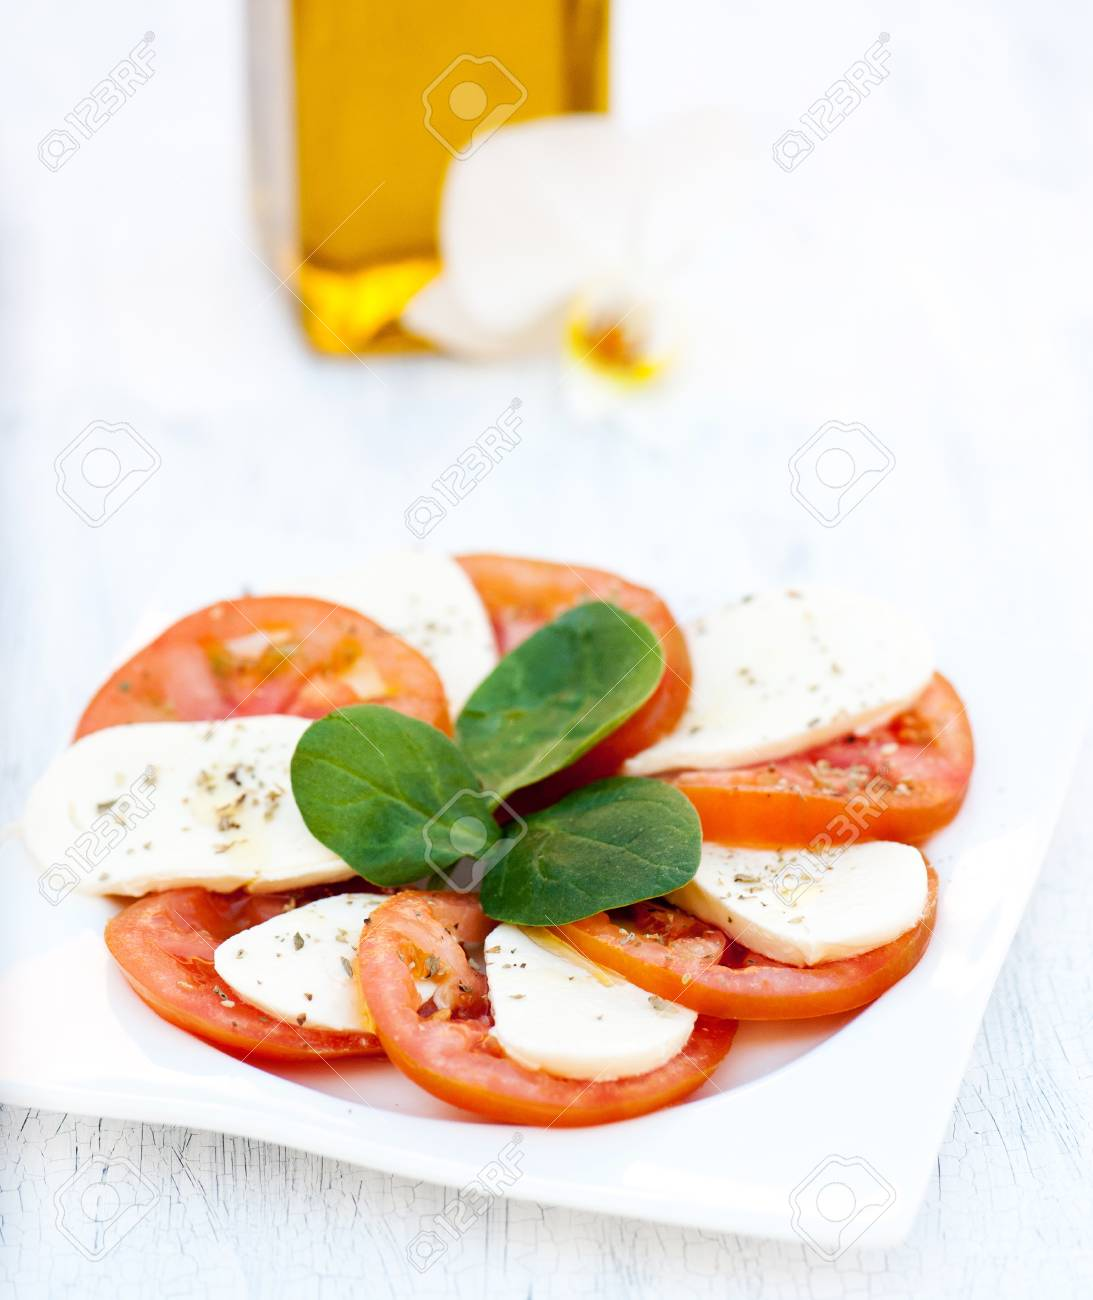 Italian salad with tomatoes and mozzarella Stock Photo - 20753720